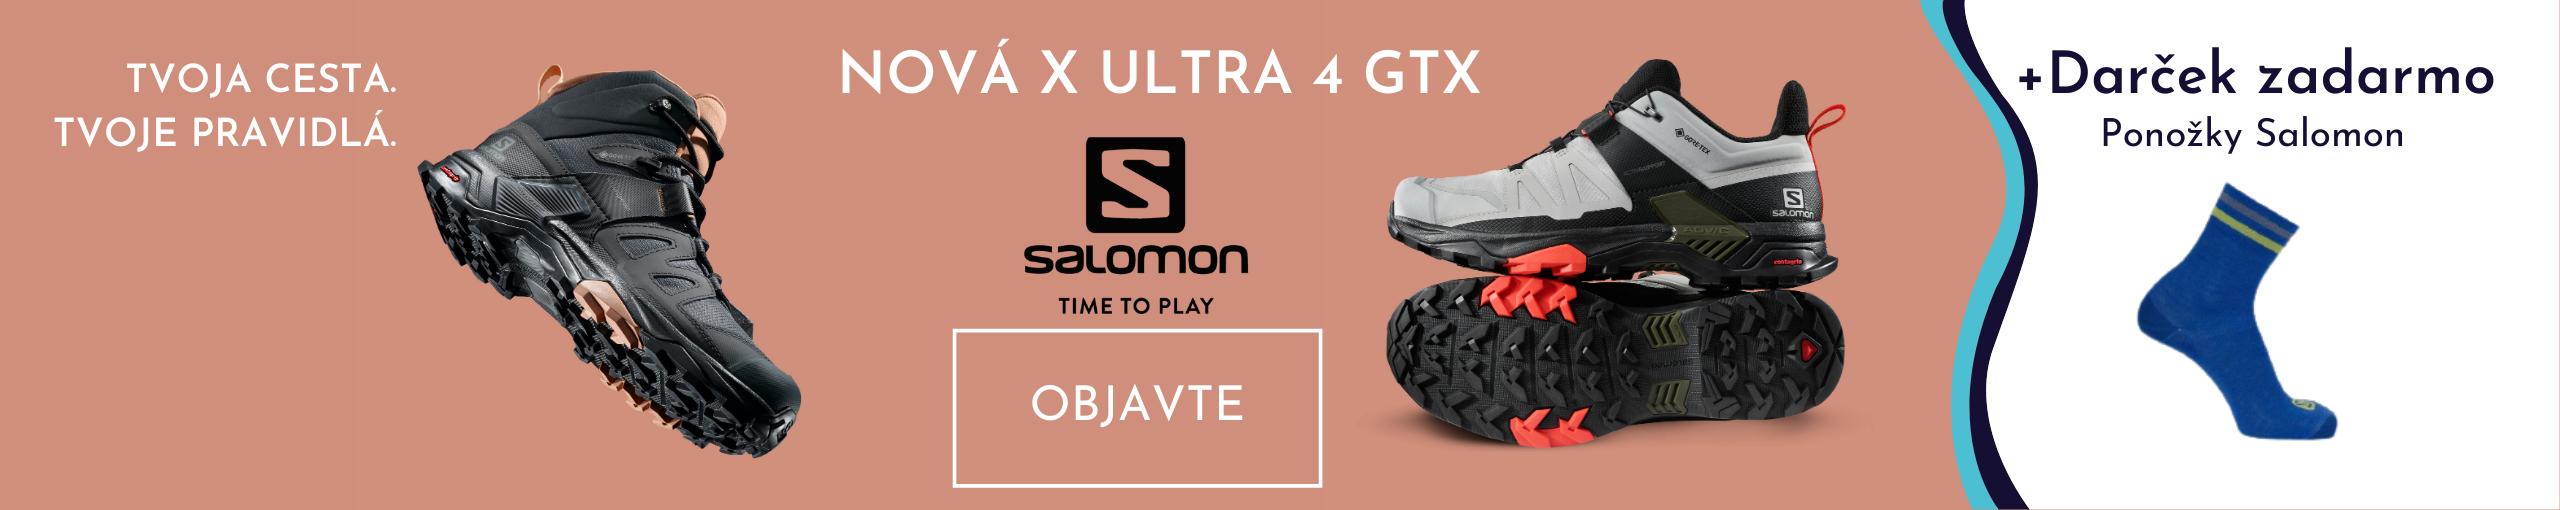 Salomon obuv X Ultra 4 GTX + ponozky Salomon zadarmo